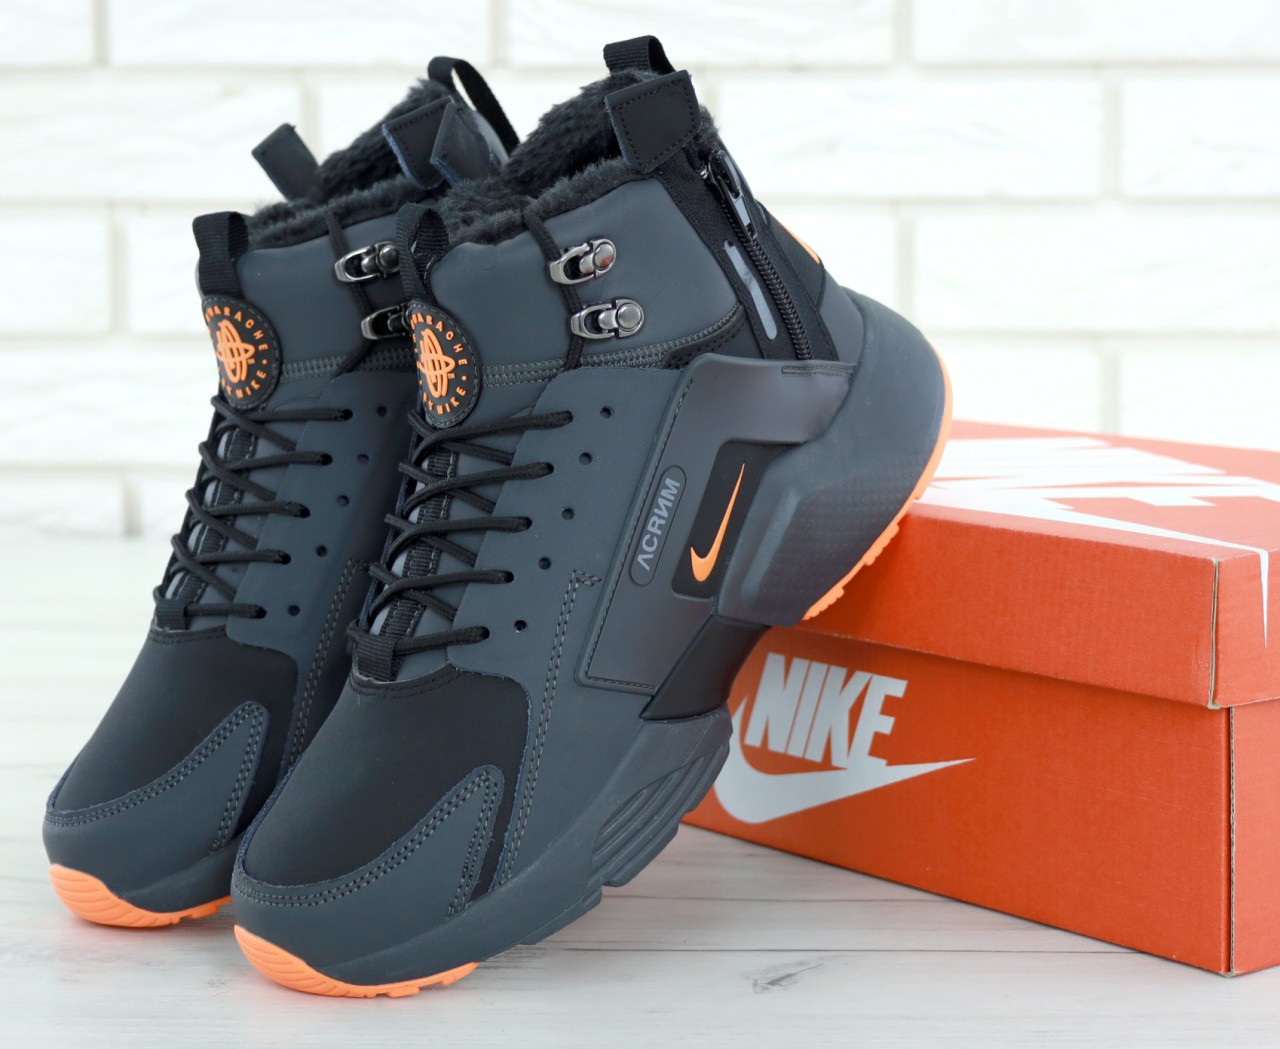 fa1bec3717d2a Зимние кроссовки мужские Nike Huarache X Acronym City Winter с мехом  реплика ААА+ р.